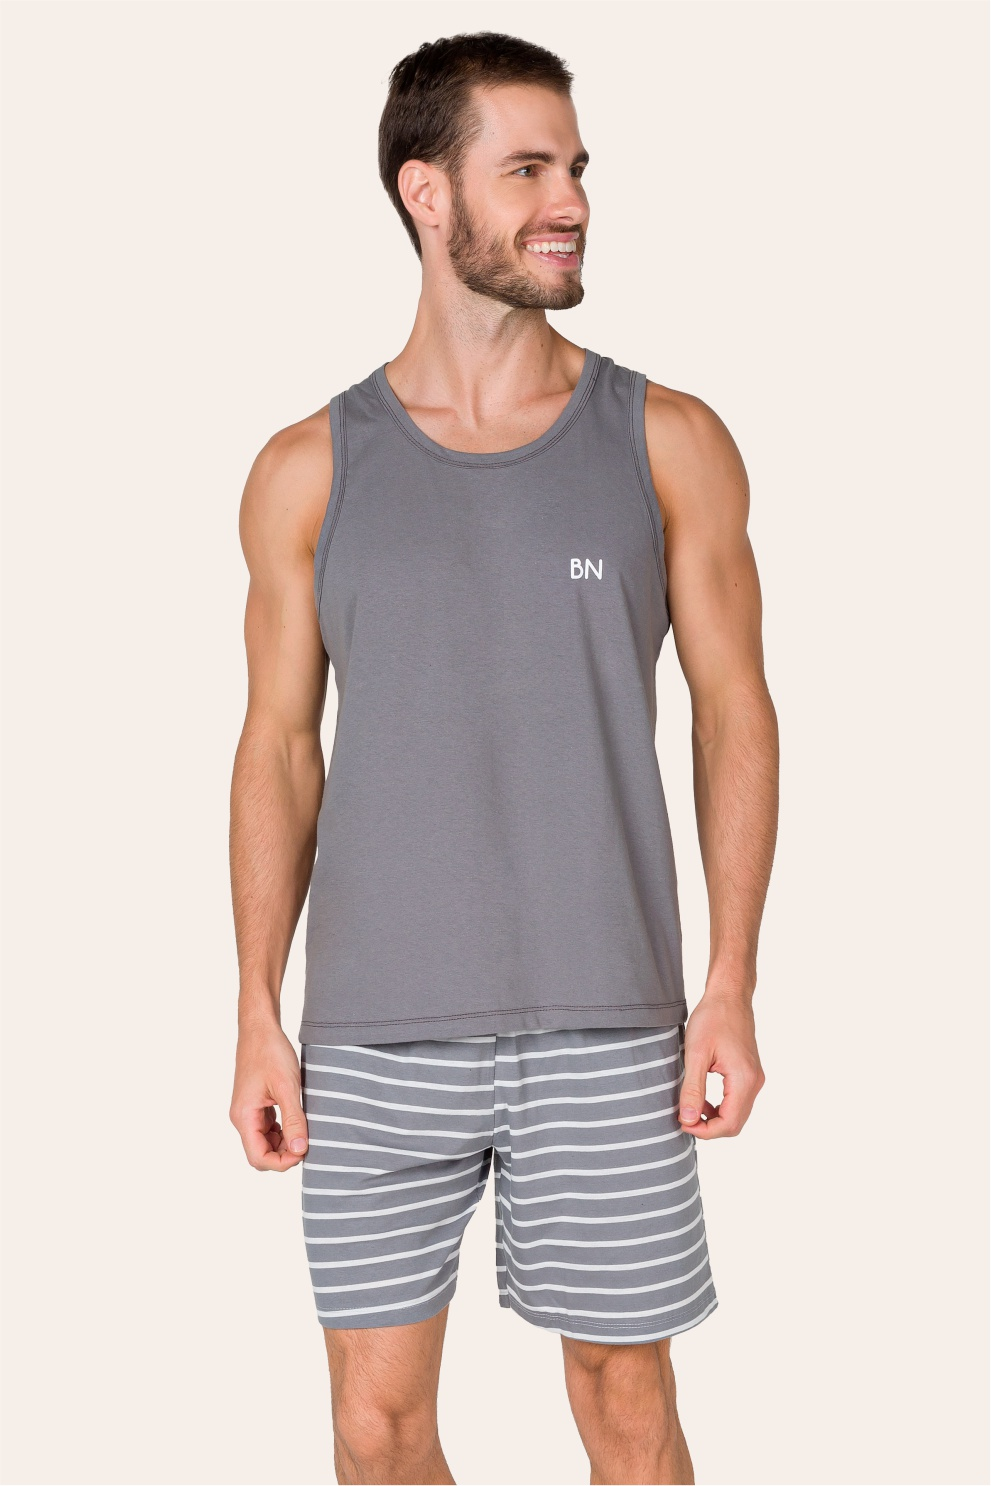 013/D - Pijama Adulto Masculino Regata